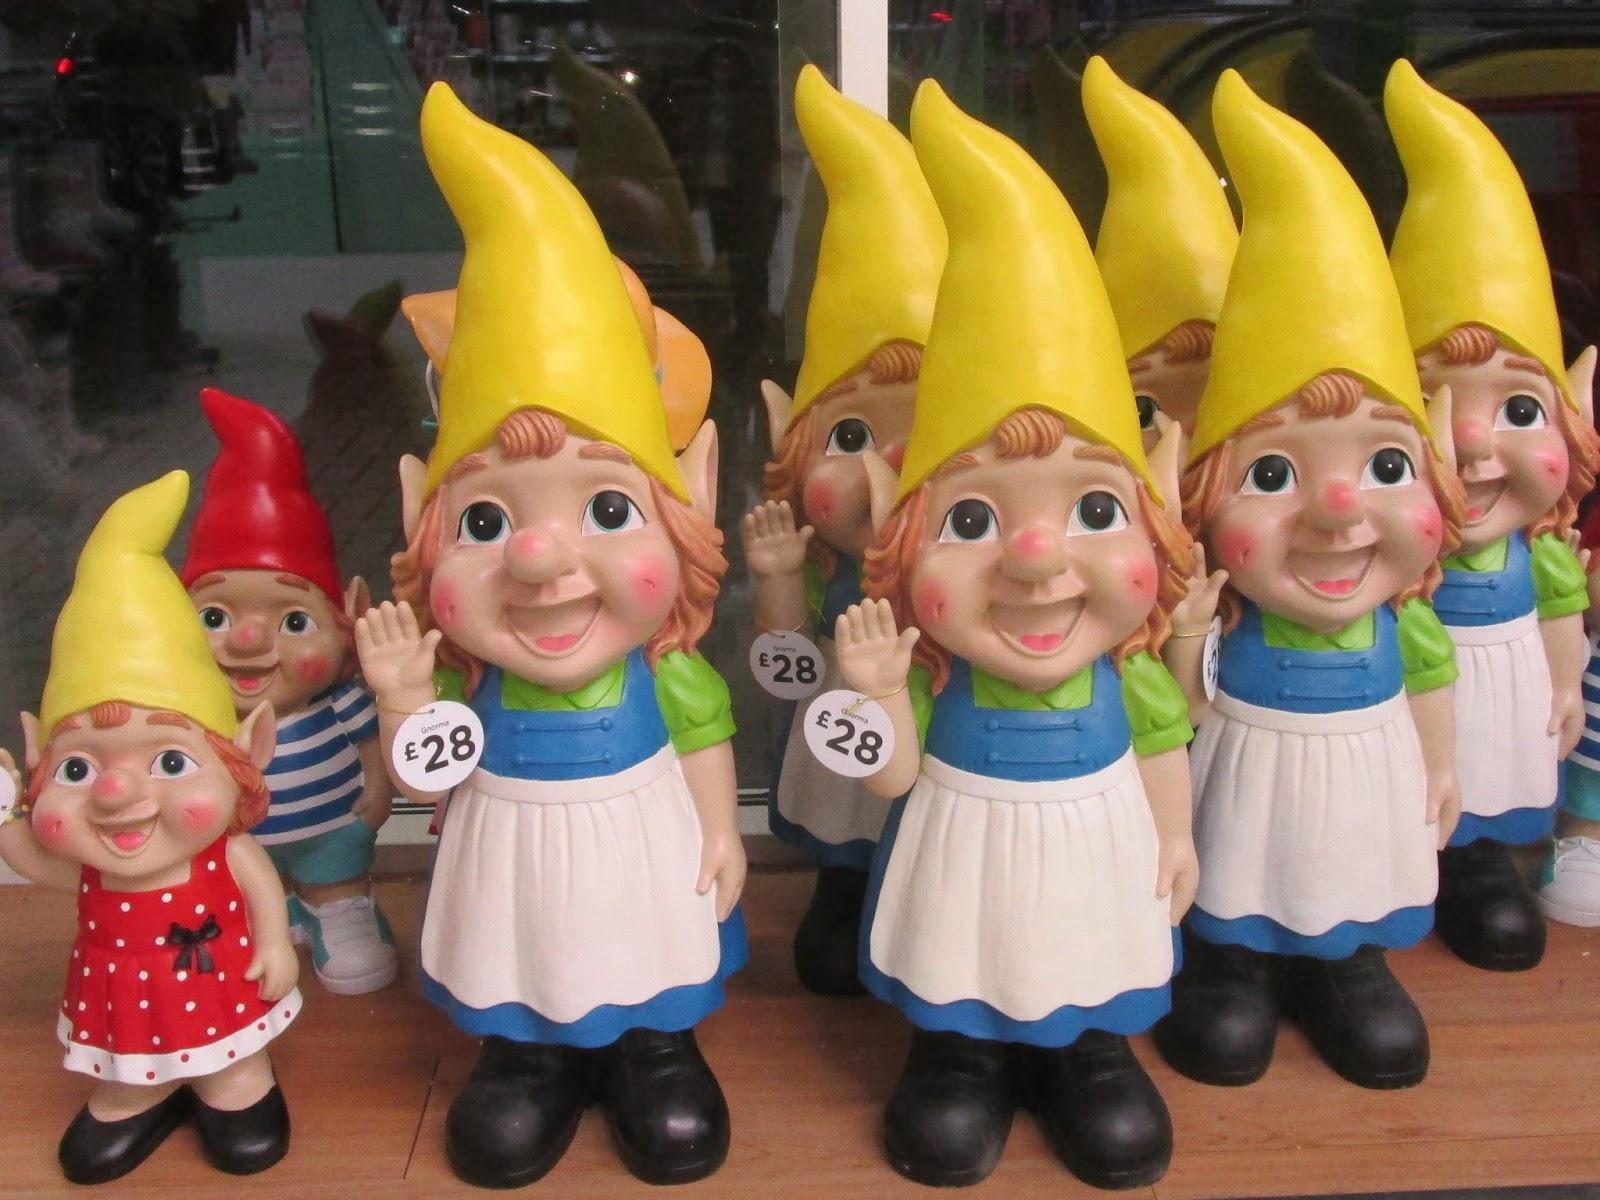 Female Gnome: Jackie'spoetry: Poets Who Write Prose